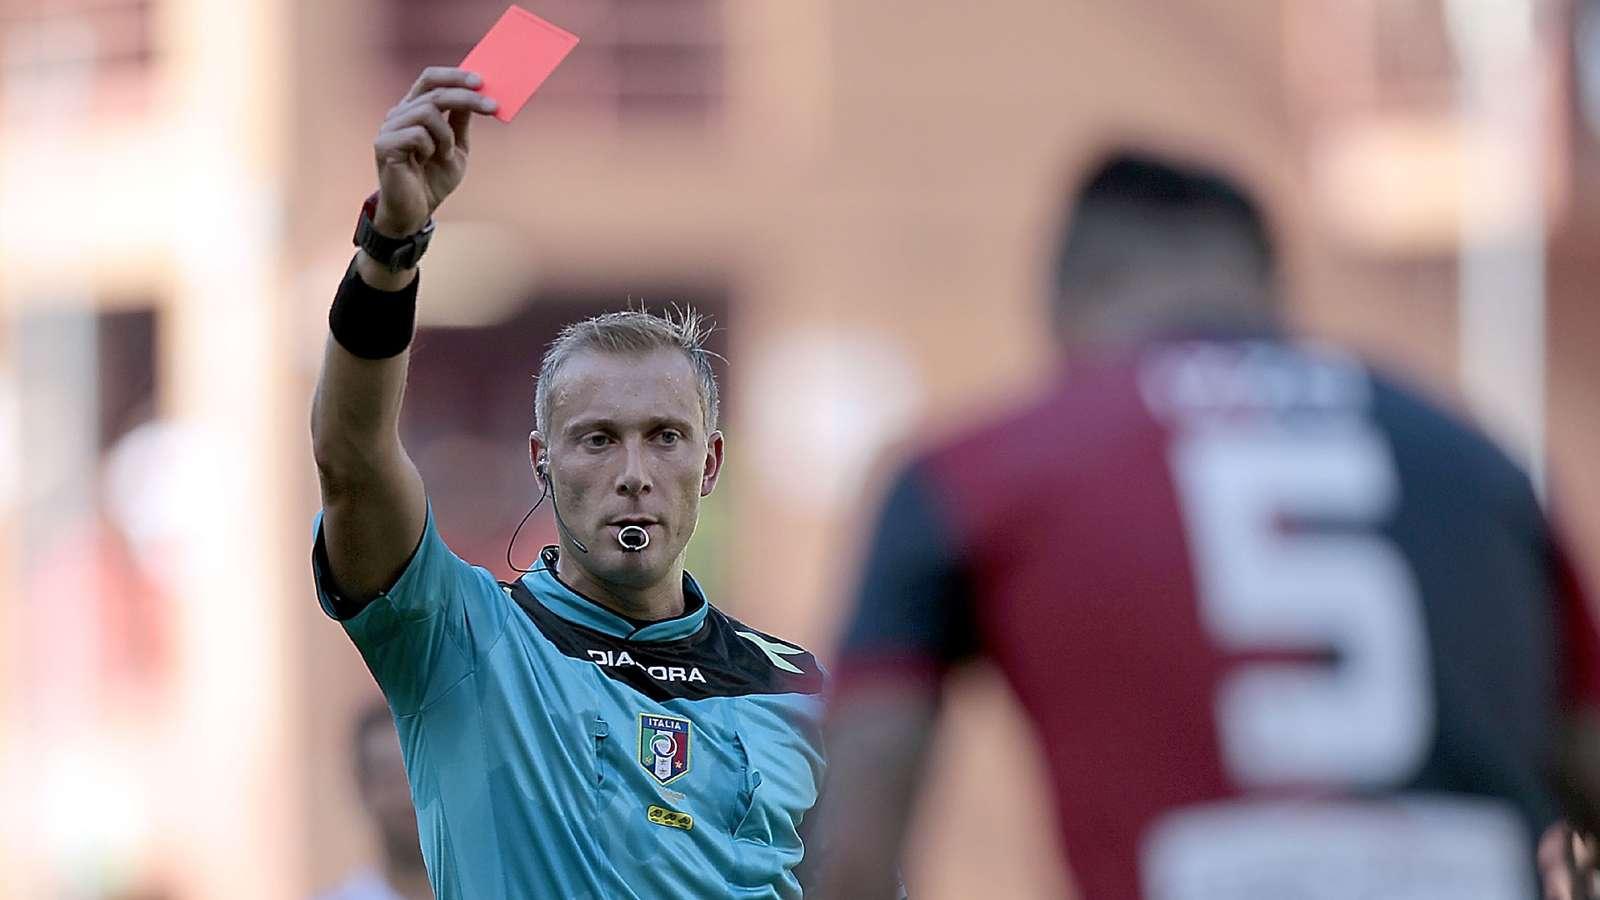 Serie D coach sent off for slapping own player - Bóng Đá